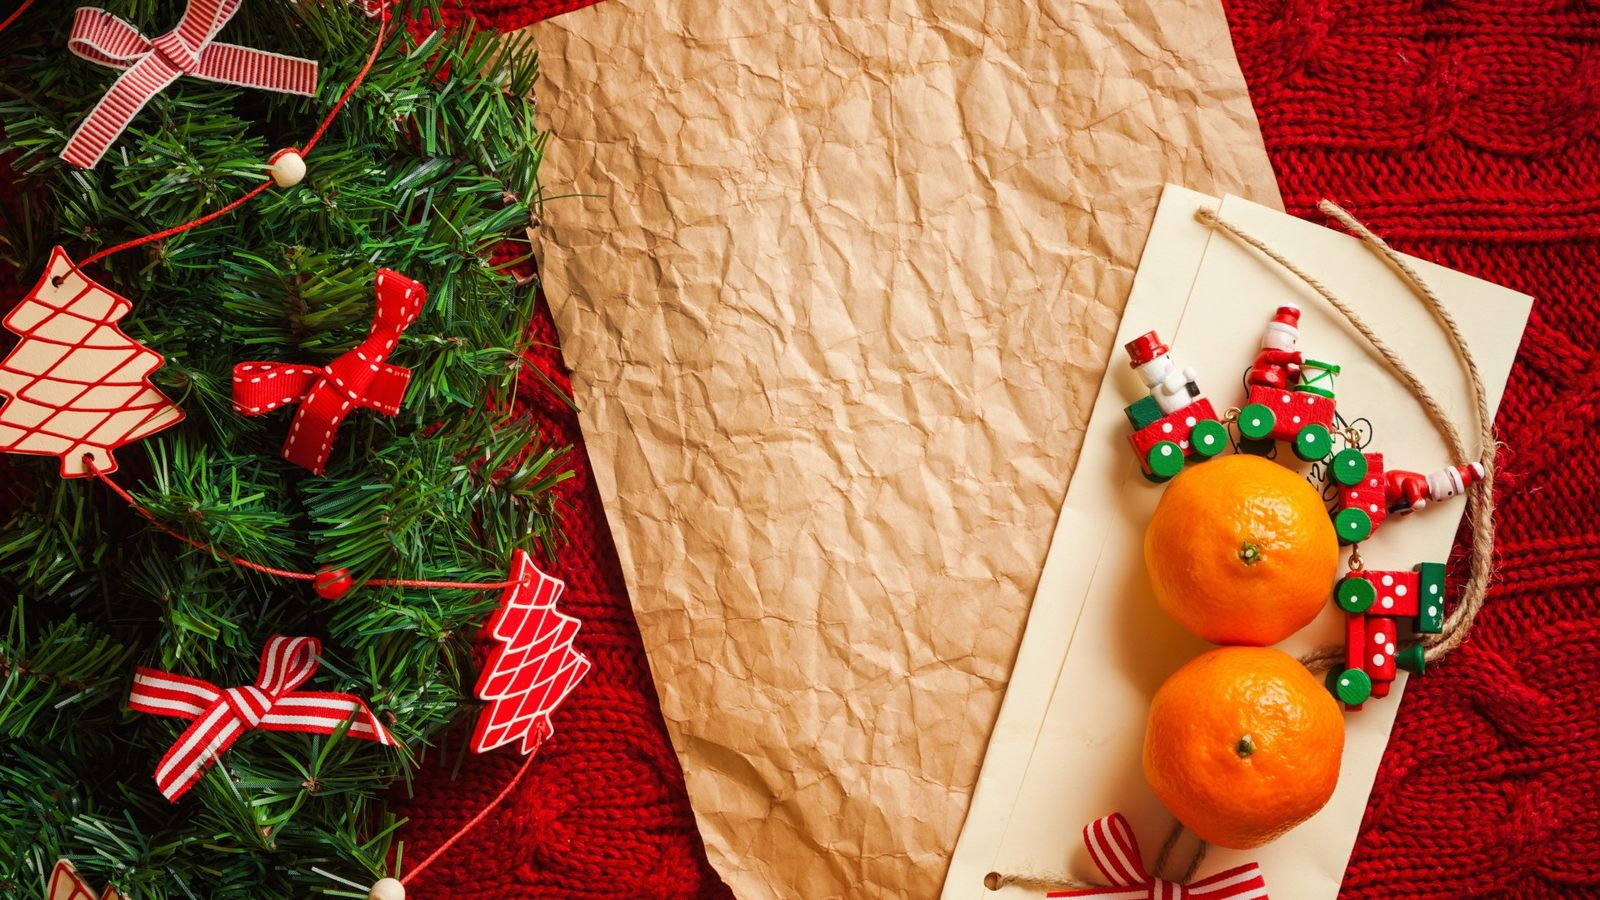 Новогодние картинки Ёлка и мандарины на рабочий стол 2018 - photo#41